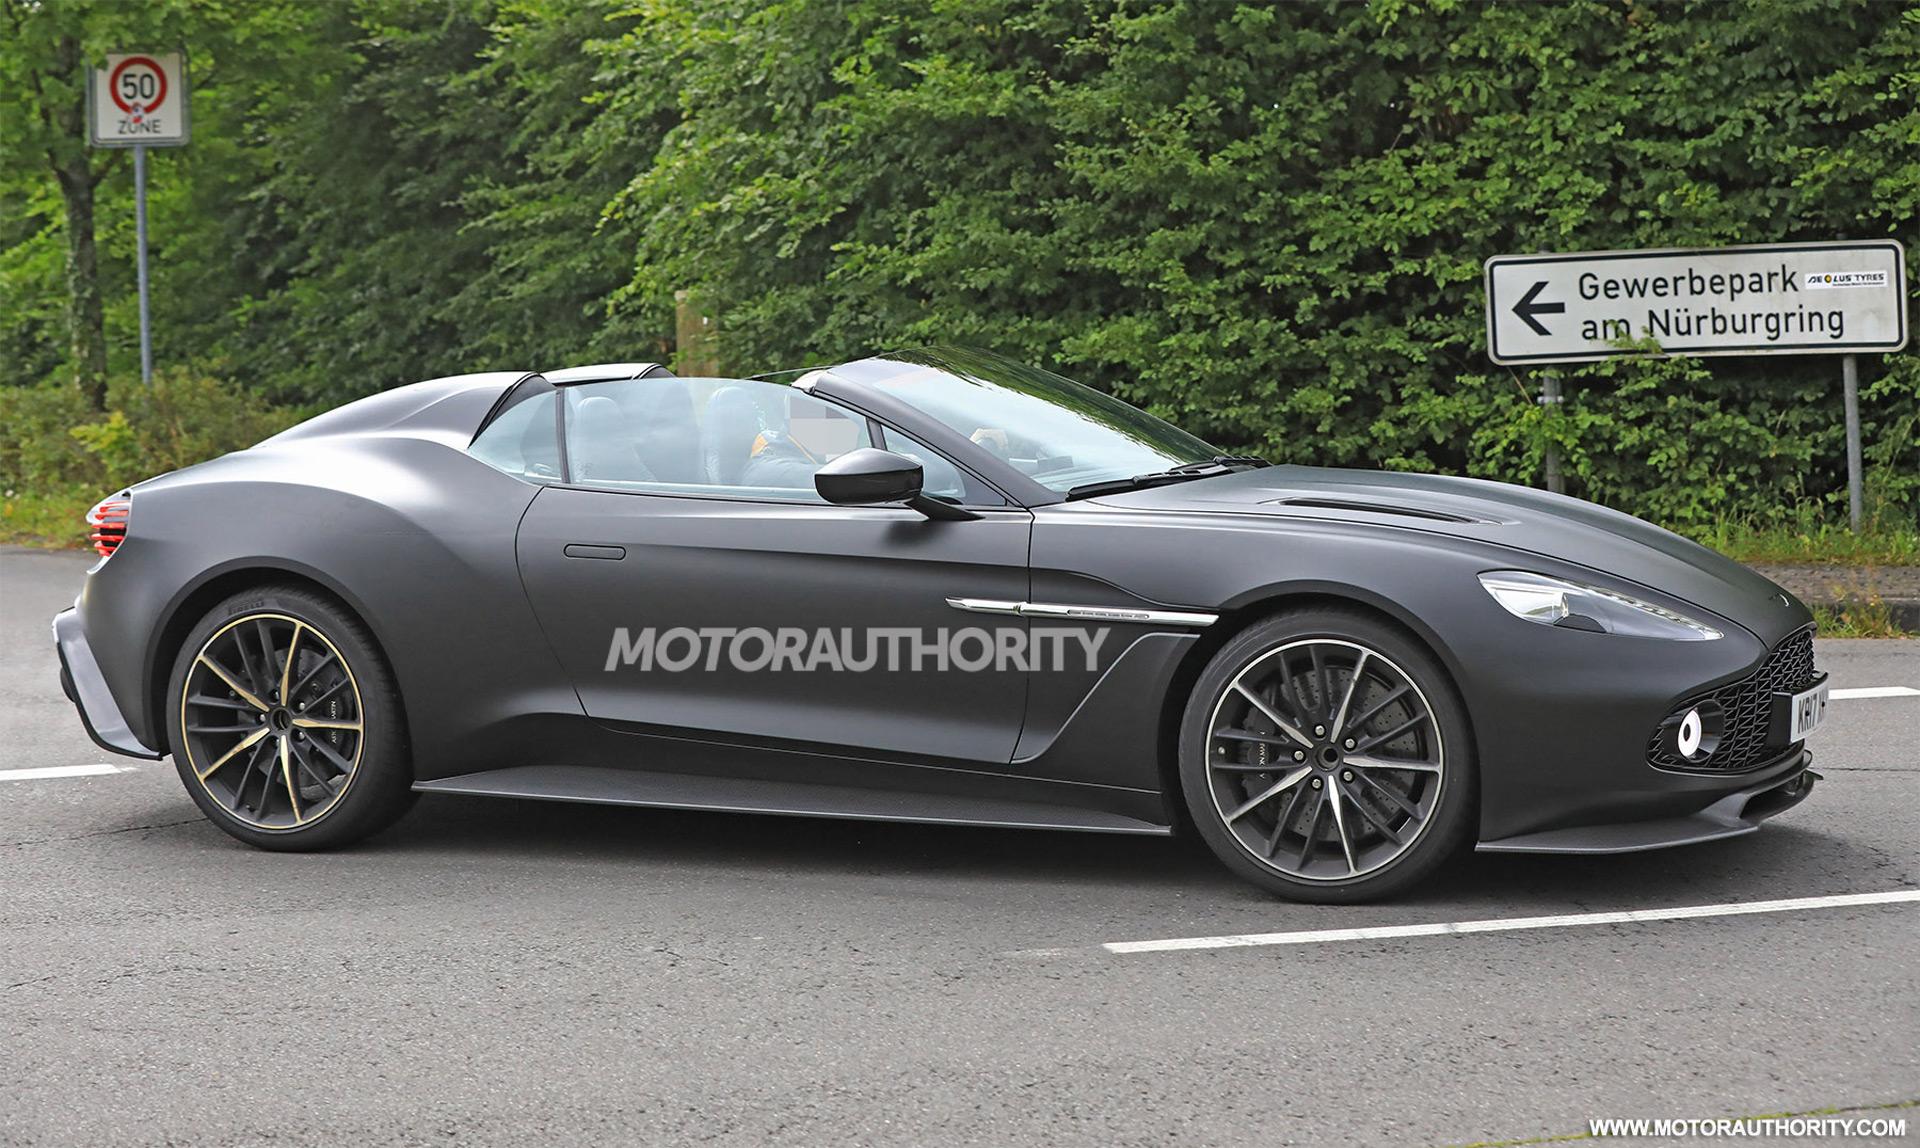 2018 Aston Martin Vanquish Zagato Speedster Spy Shots